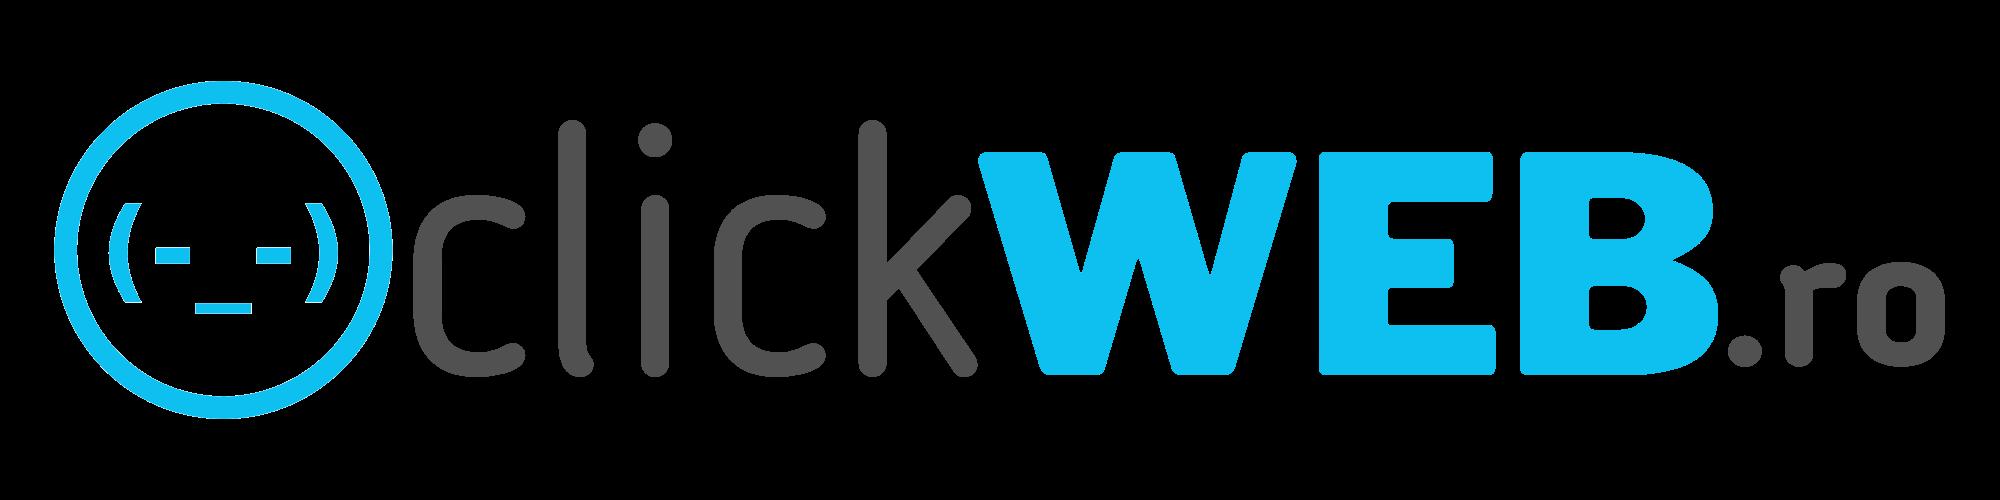 Web design SC CLICKWEB.RO SRL